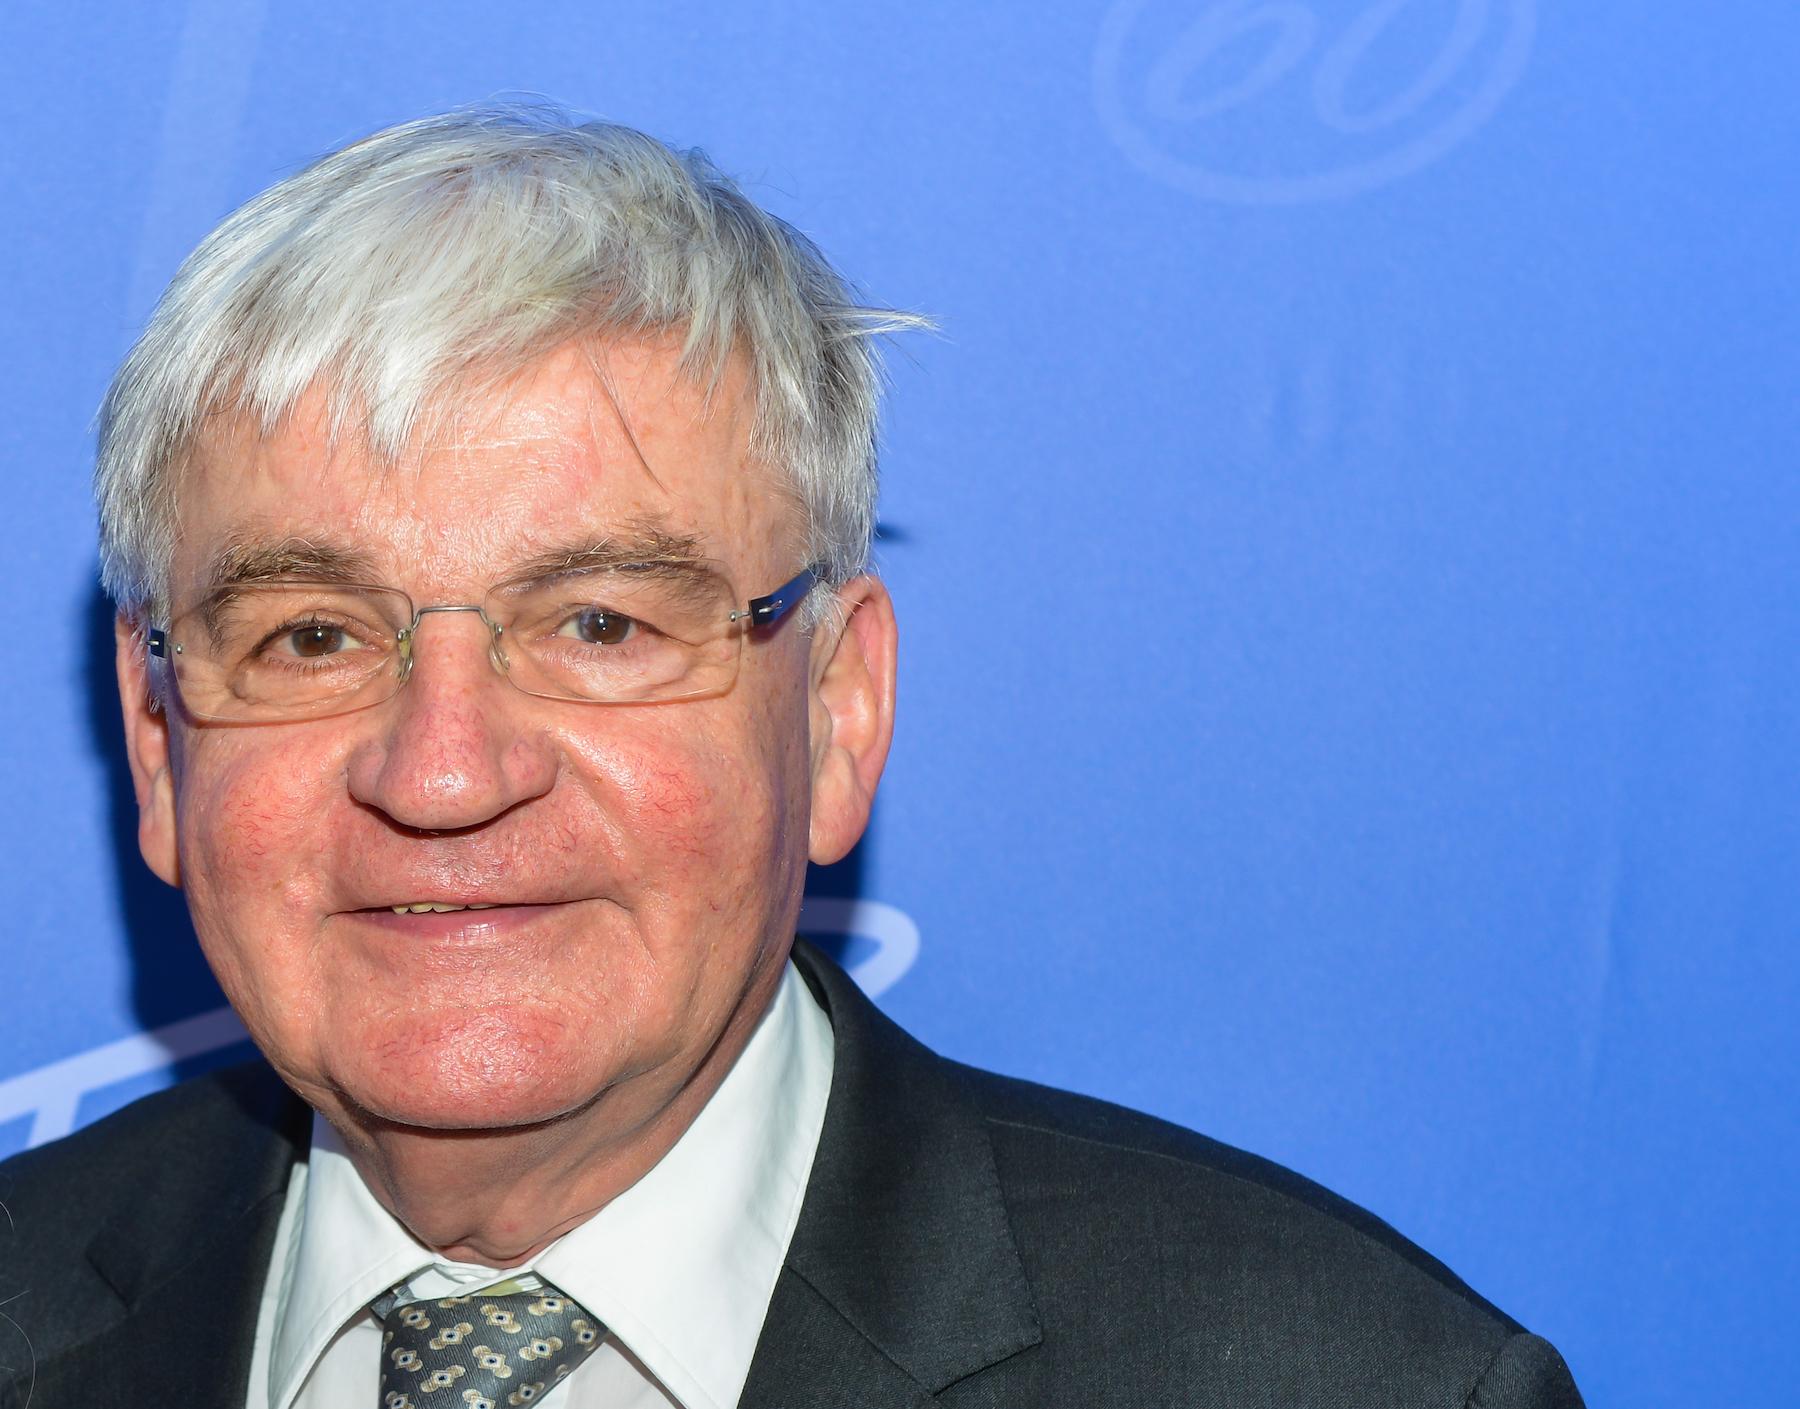 IOC Präsident Thomas Bach Empfang 20140110-11